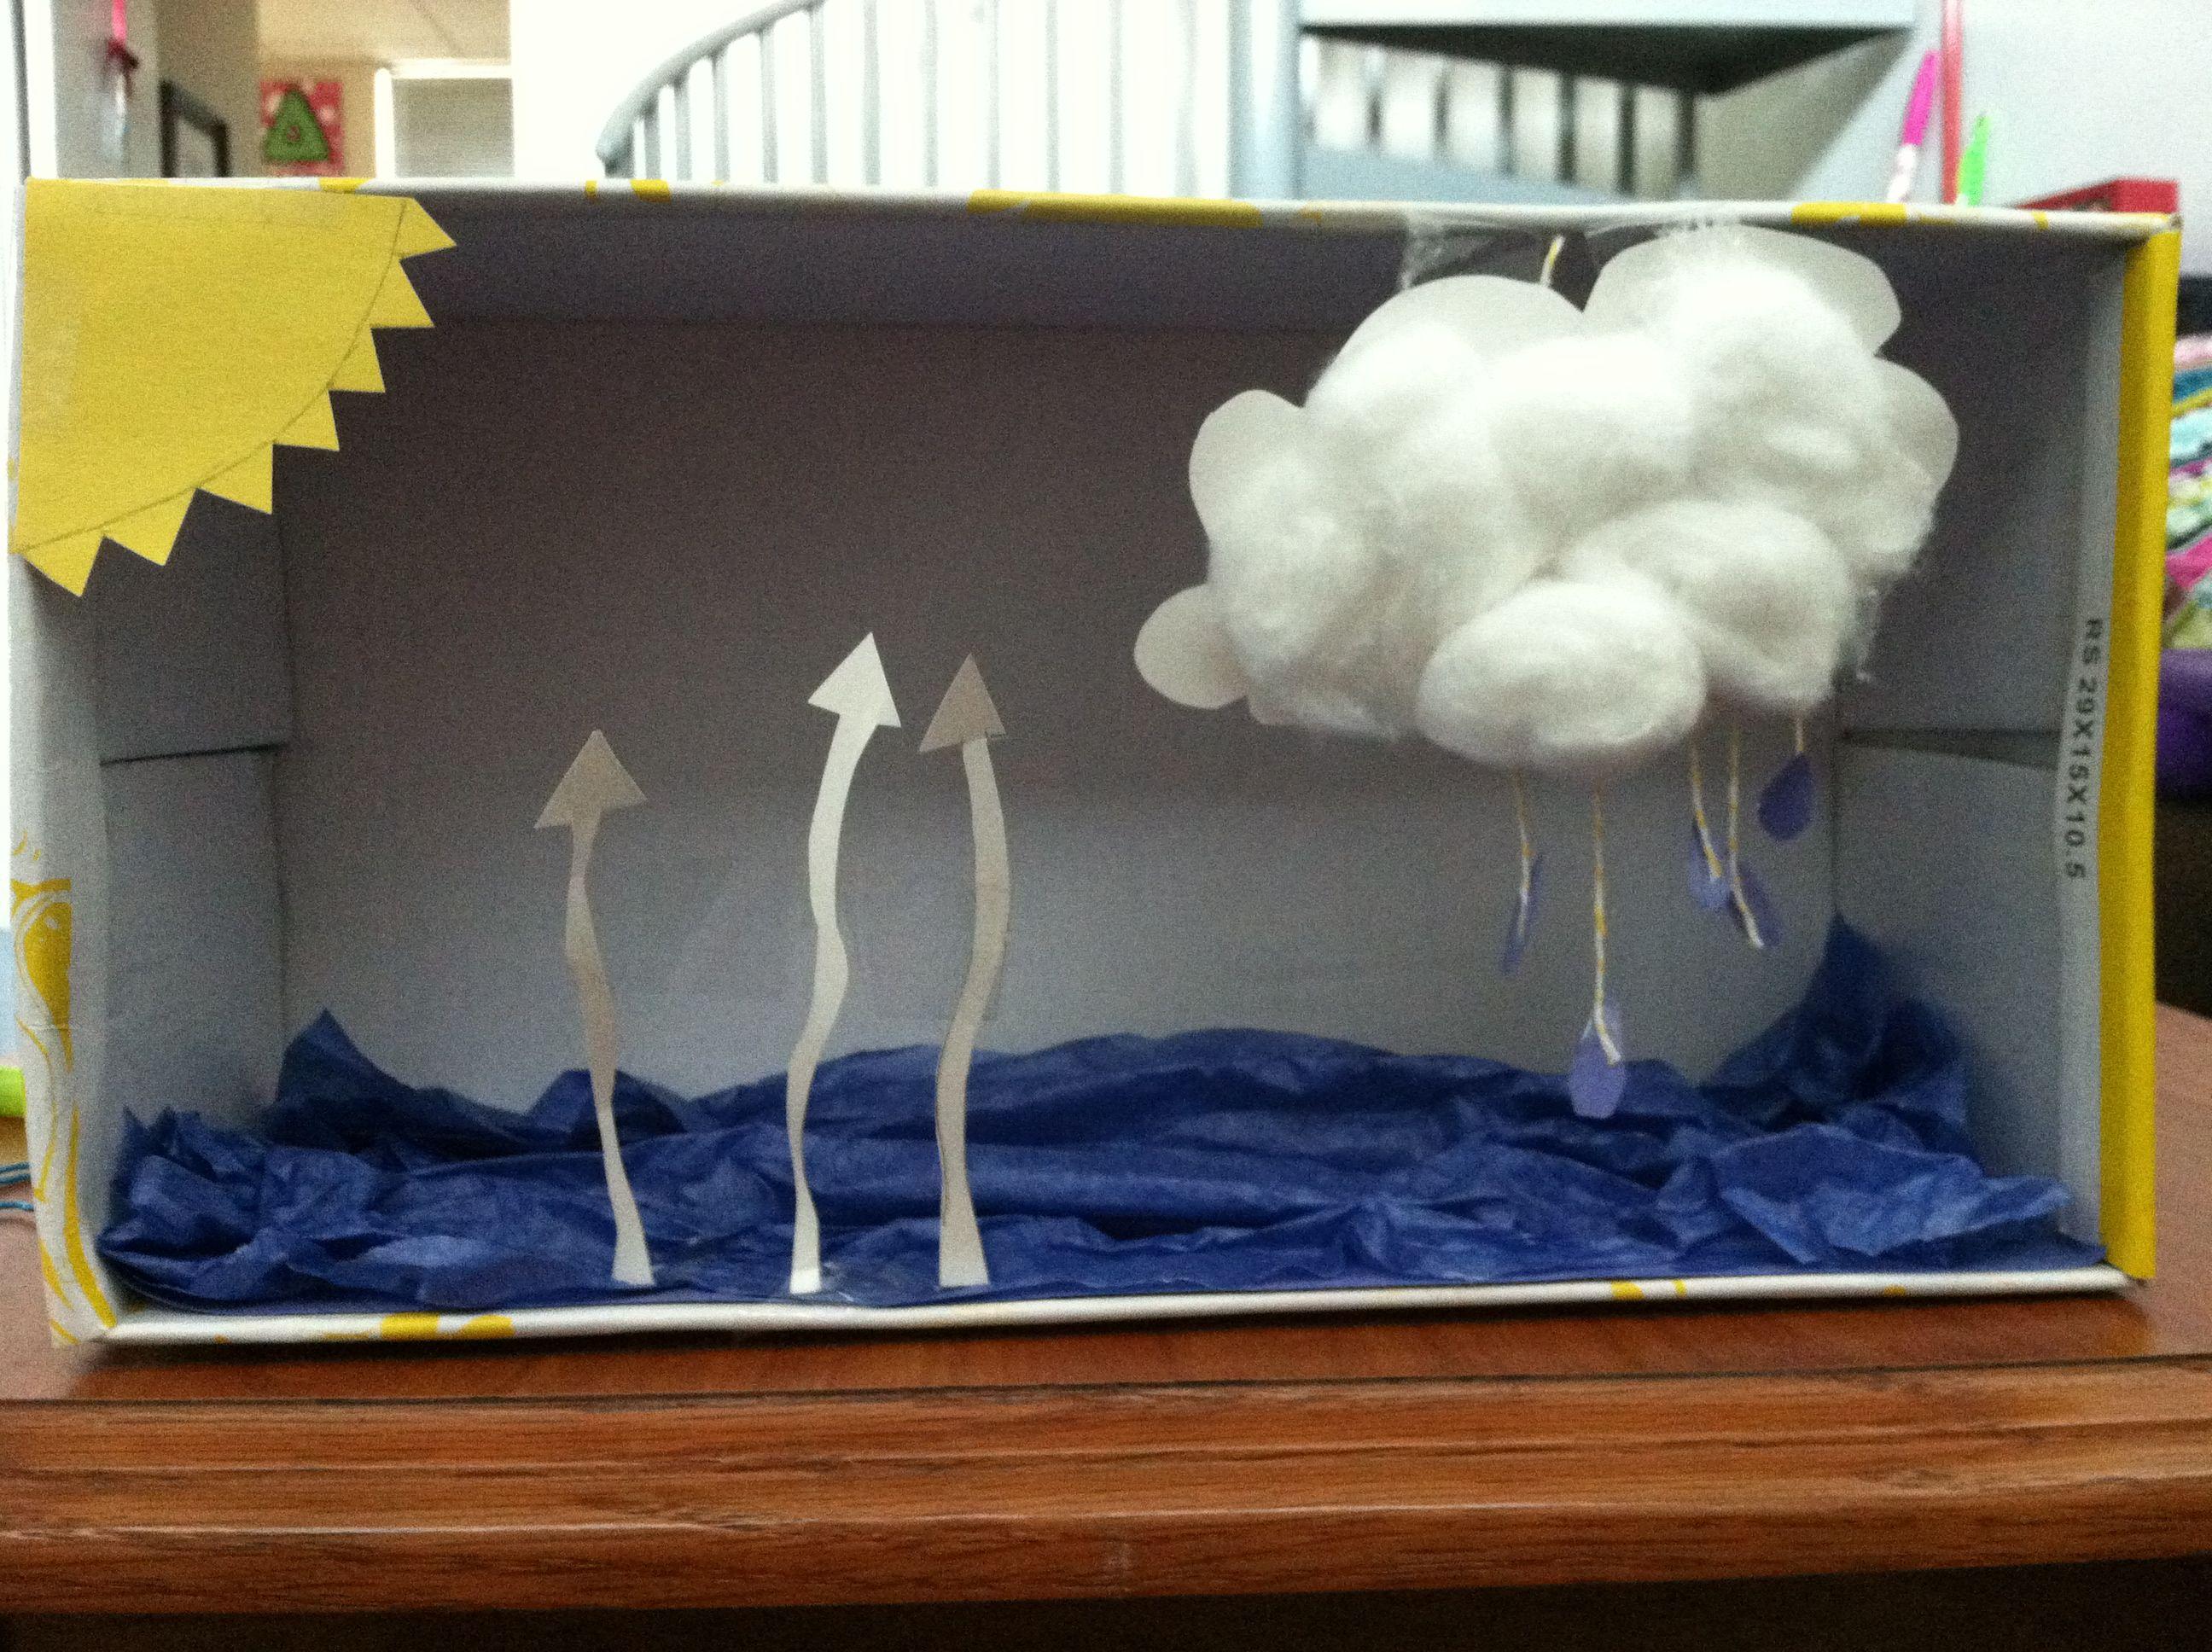 Water Cycle Diorama